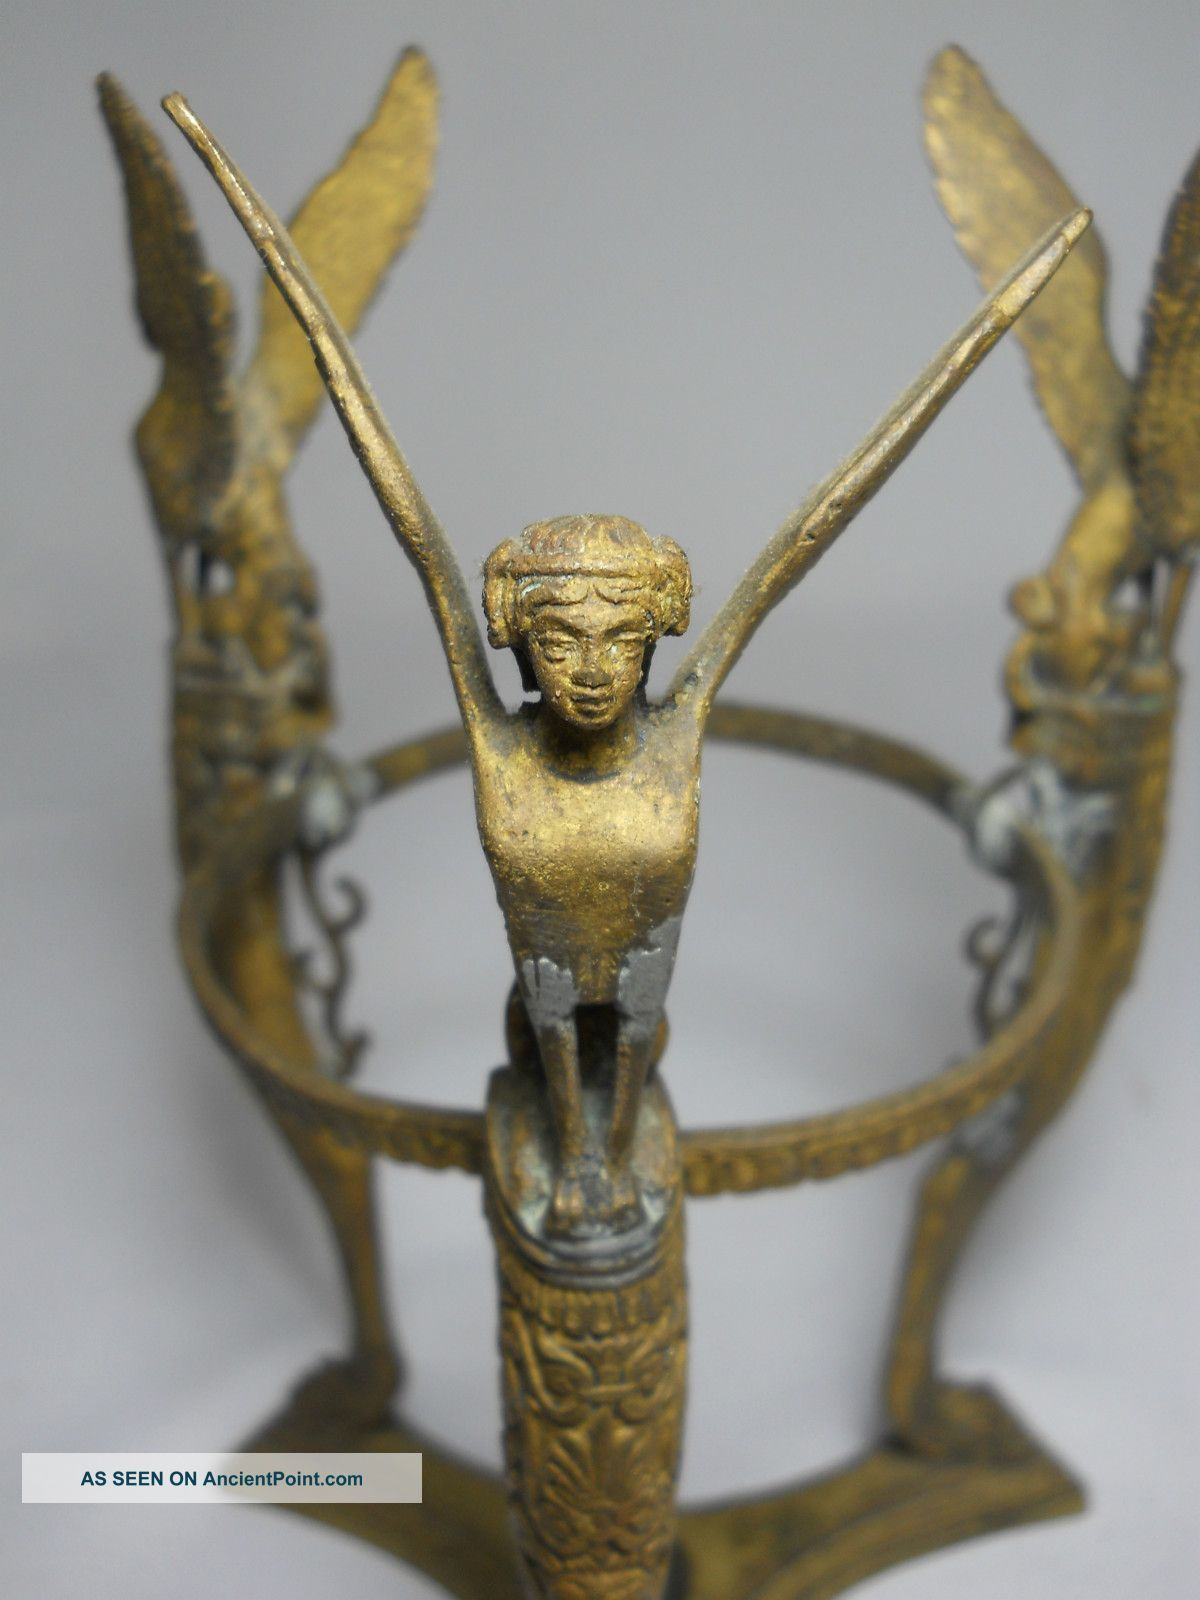 Unique Ornate Antique Brass Flying Triple Sphinx Vase Holder Stand - Victorian